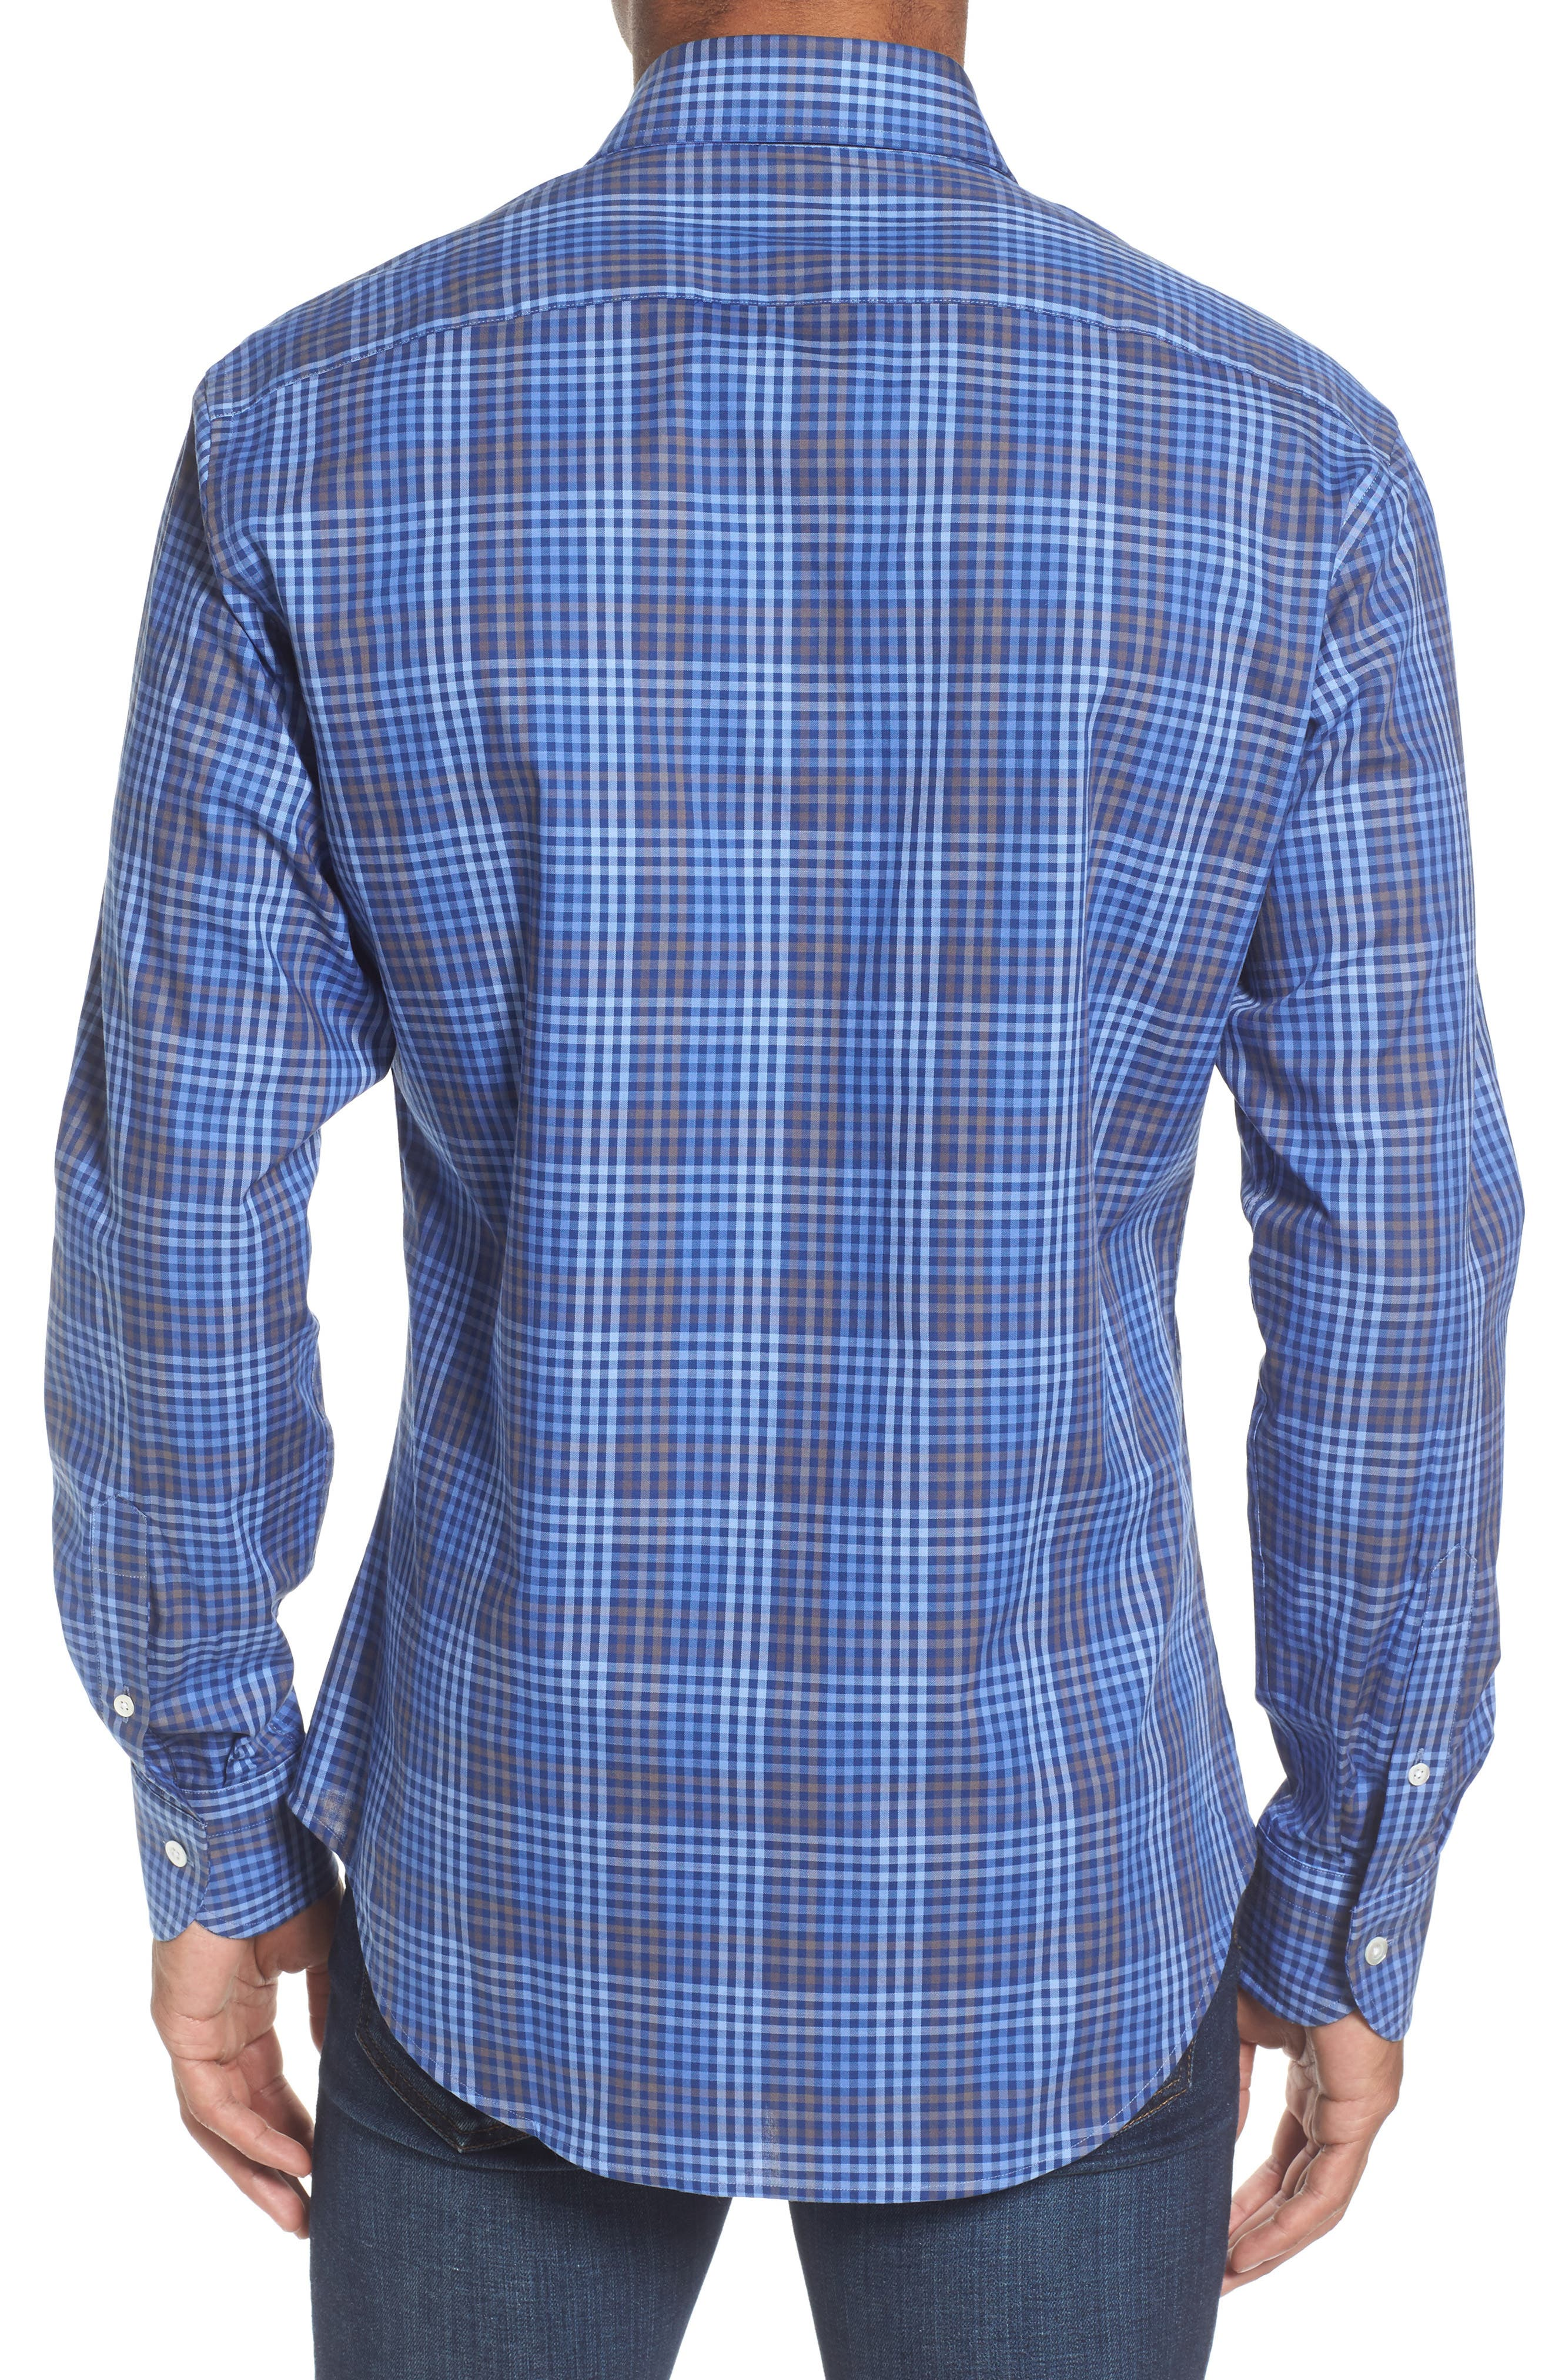 Alden Slim Fit Check Sport Shirt,                             Alternate thumbnail 2, color,                             400